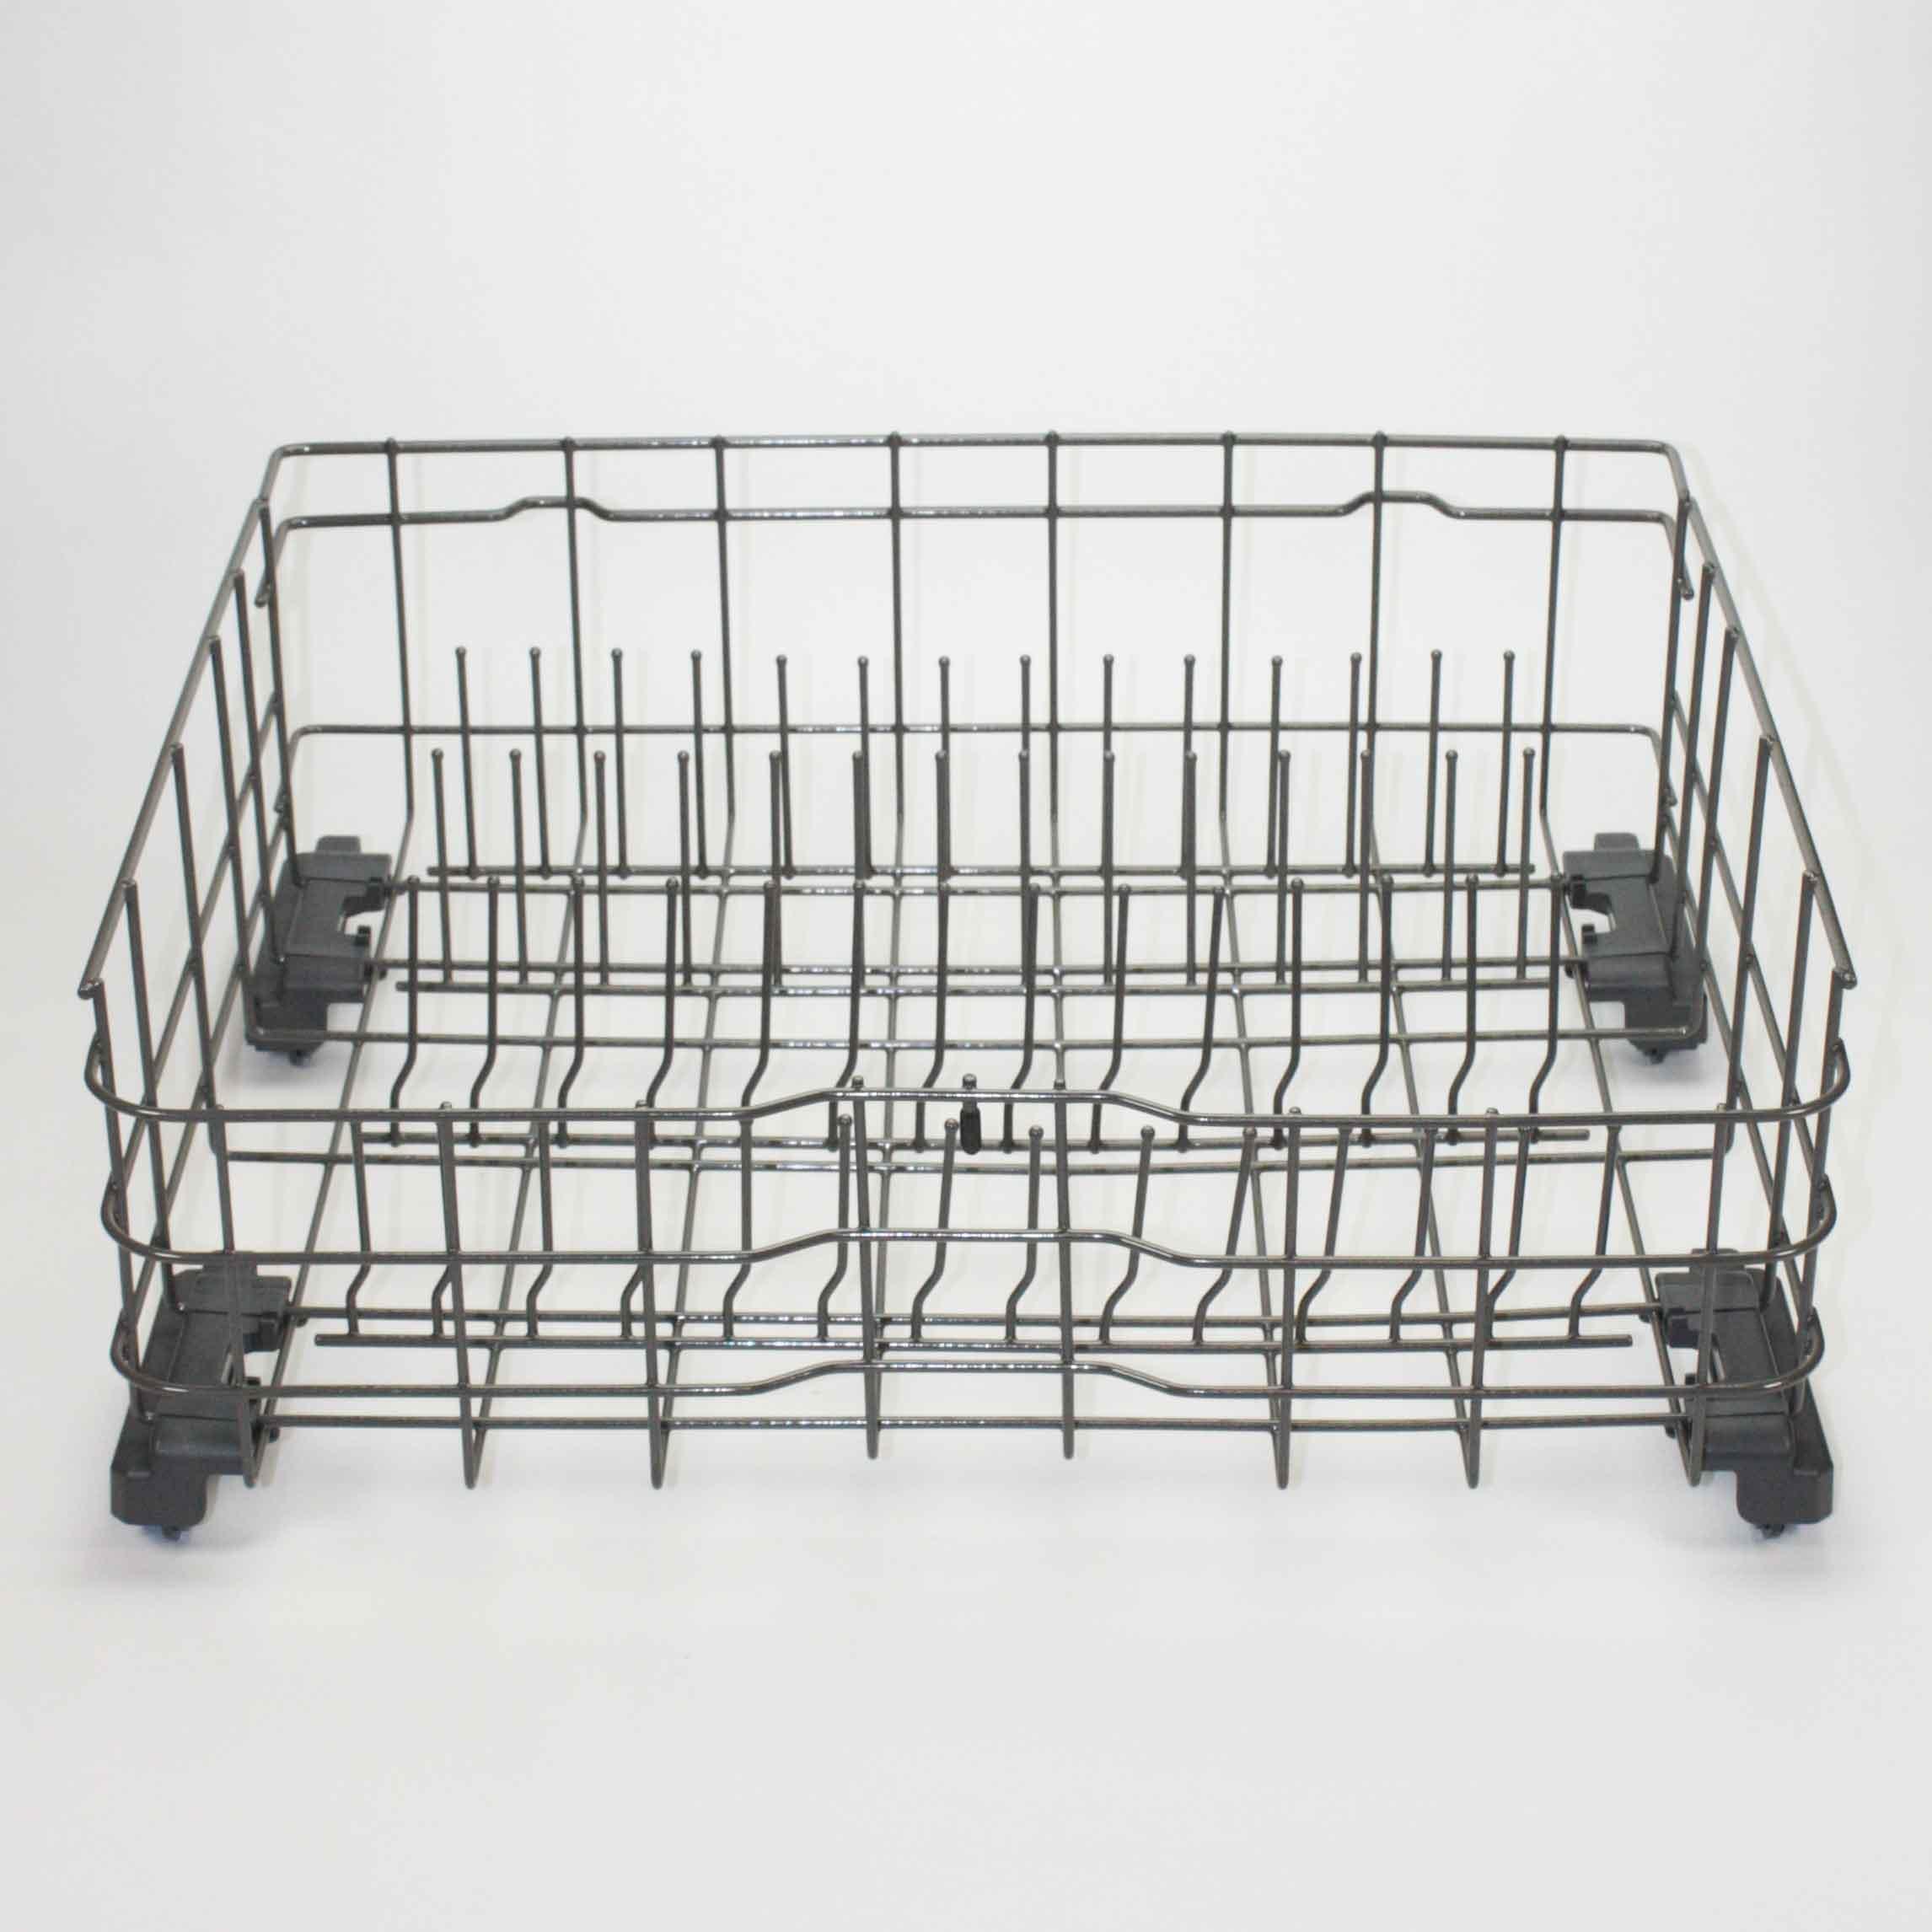 WD28X21715 For GE Dishwasher Lower Dishrack